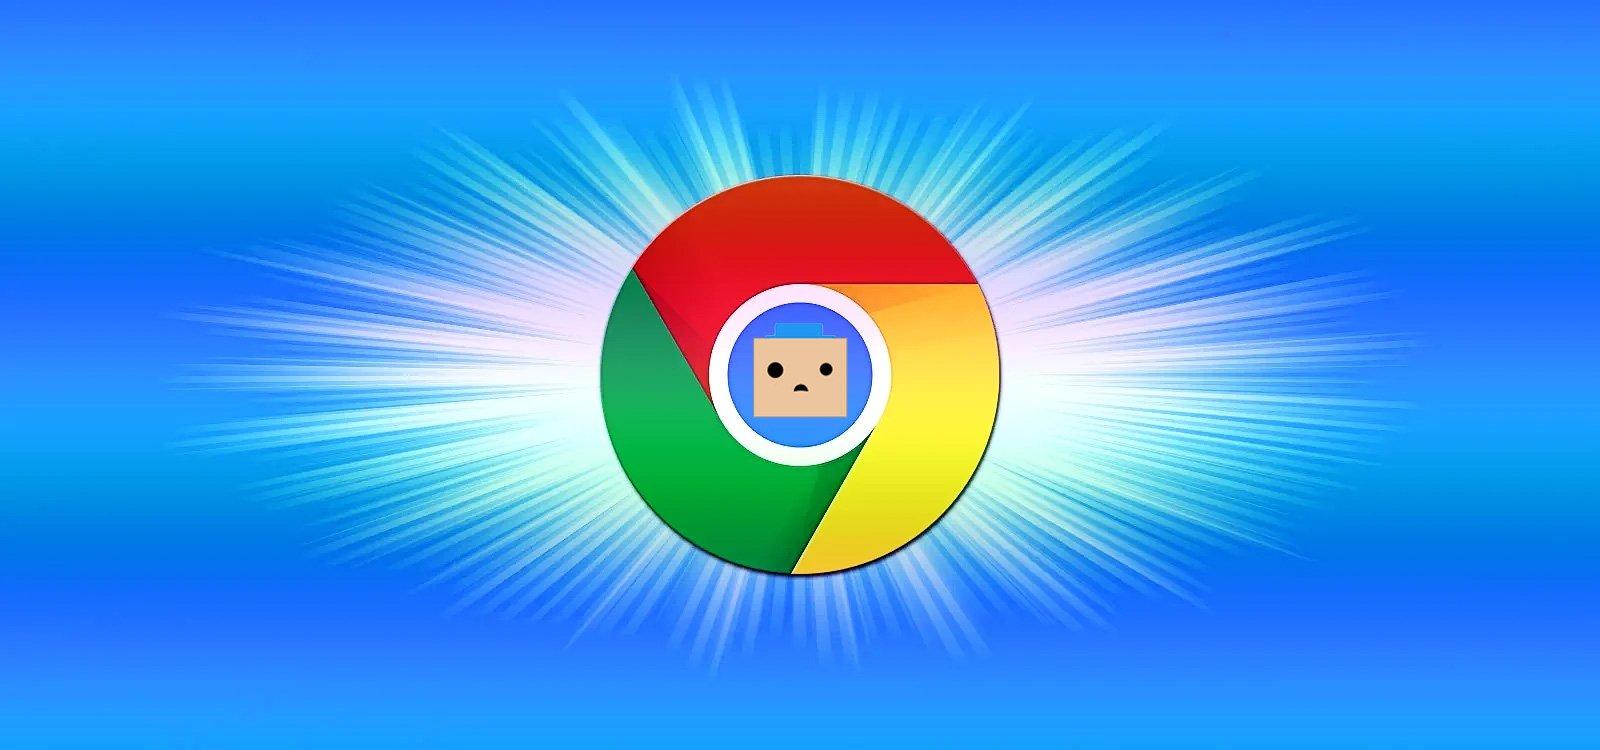 Популярное Chrome-расширение The Great Suspender содержало вредоносное ПО